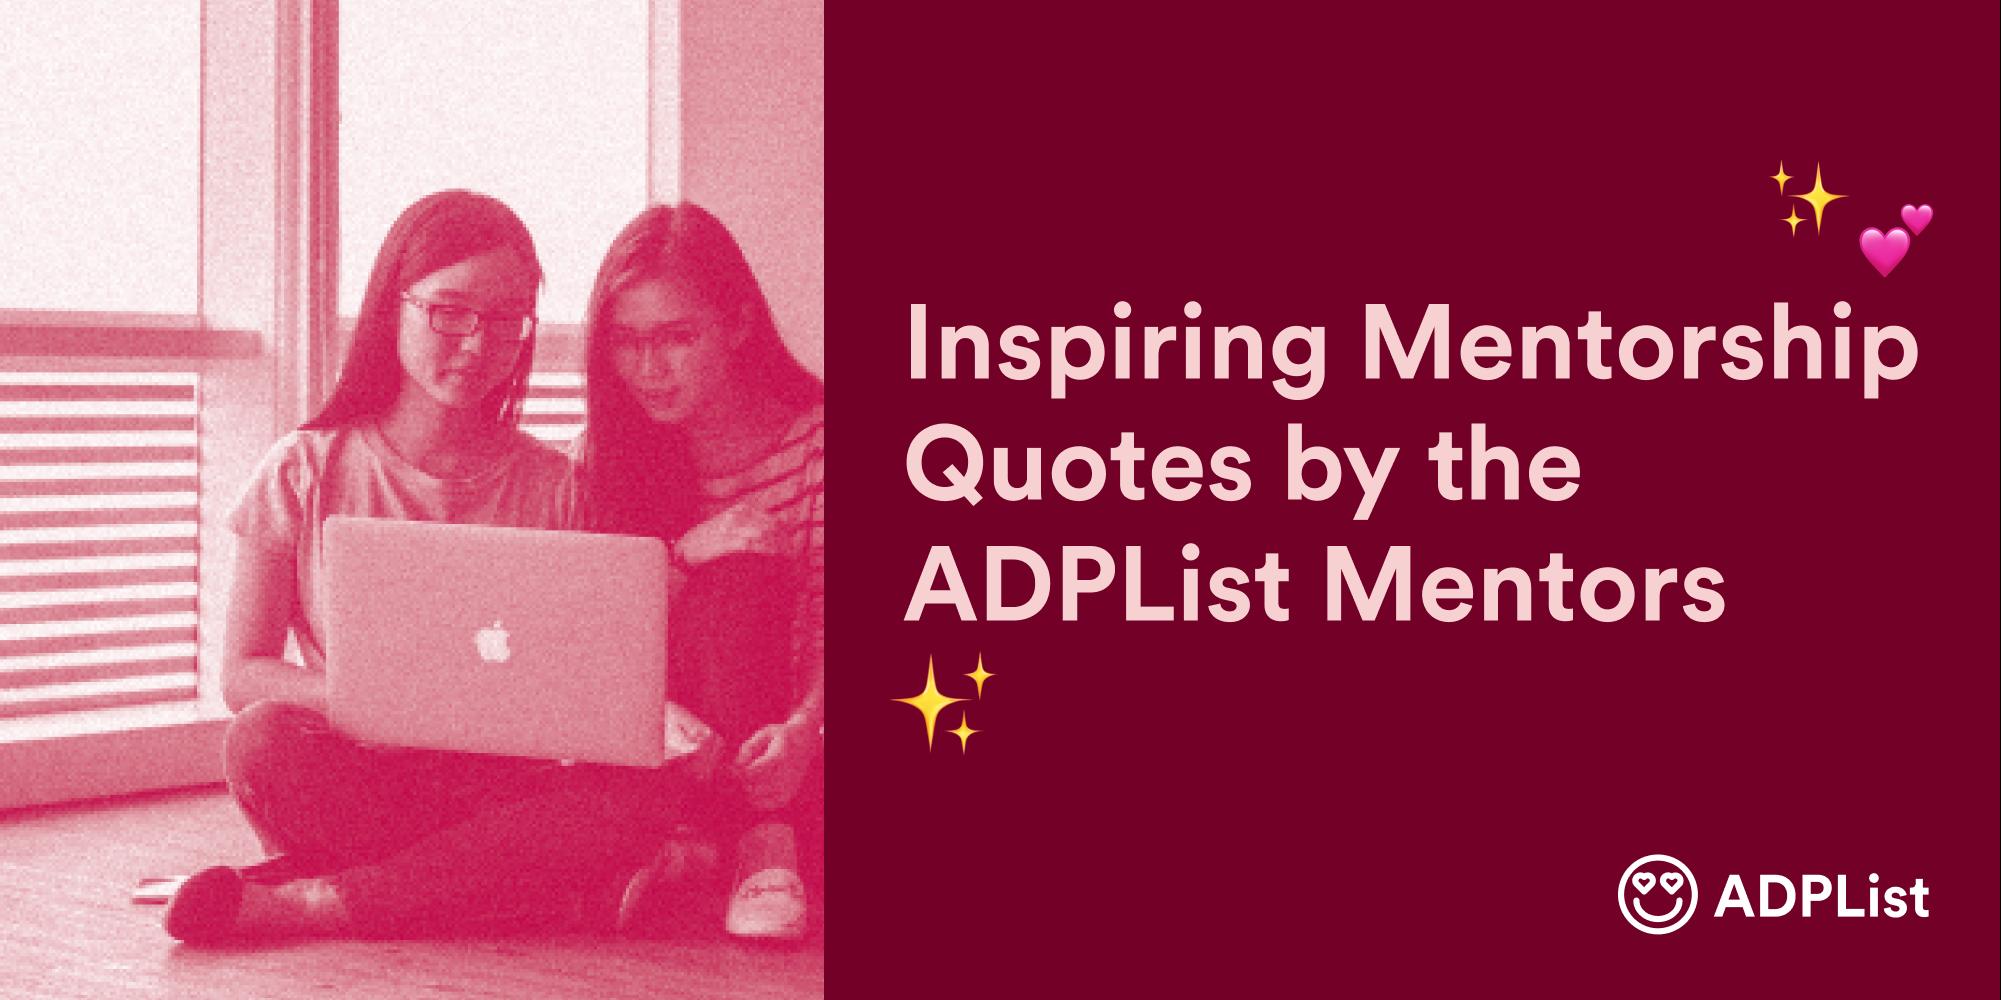 Inspiring Mentorship Quotes by the ADPList Mentors